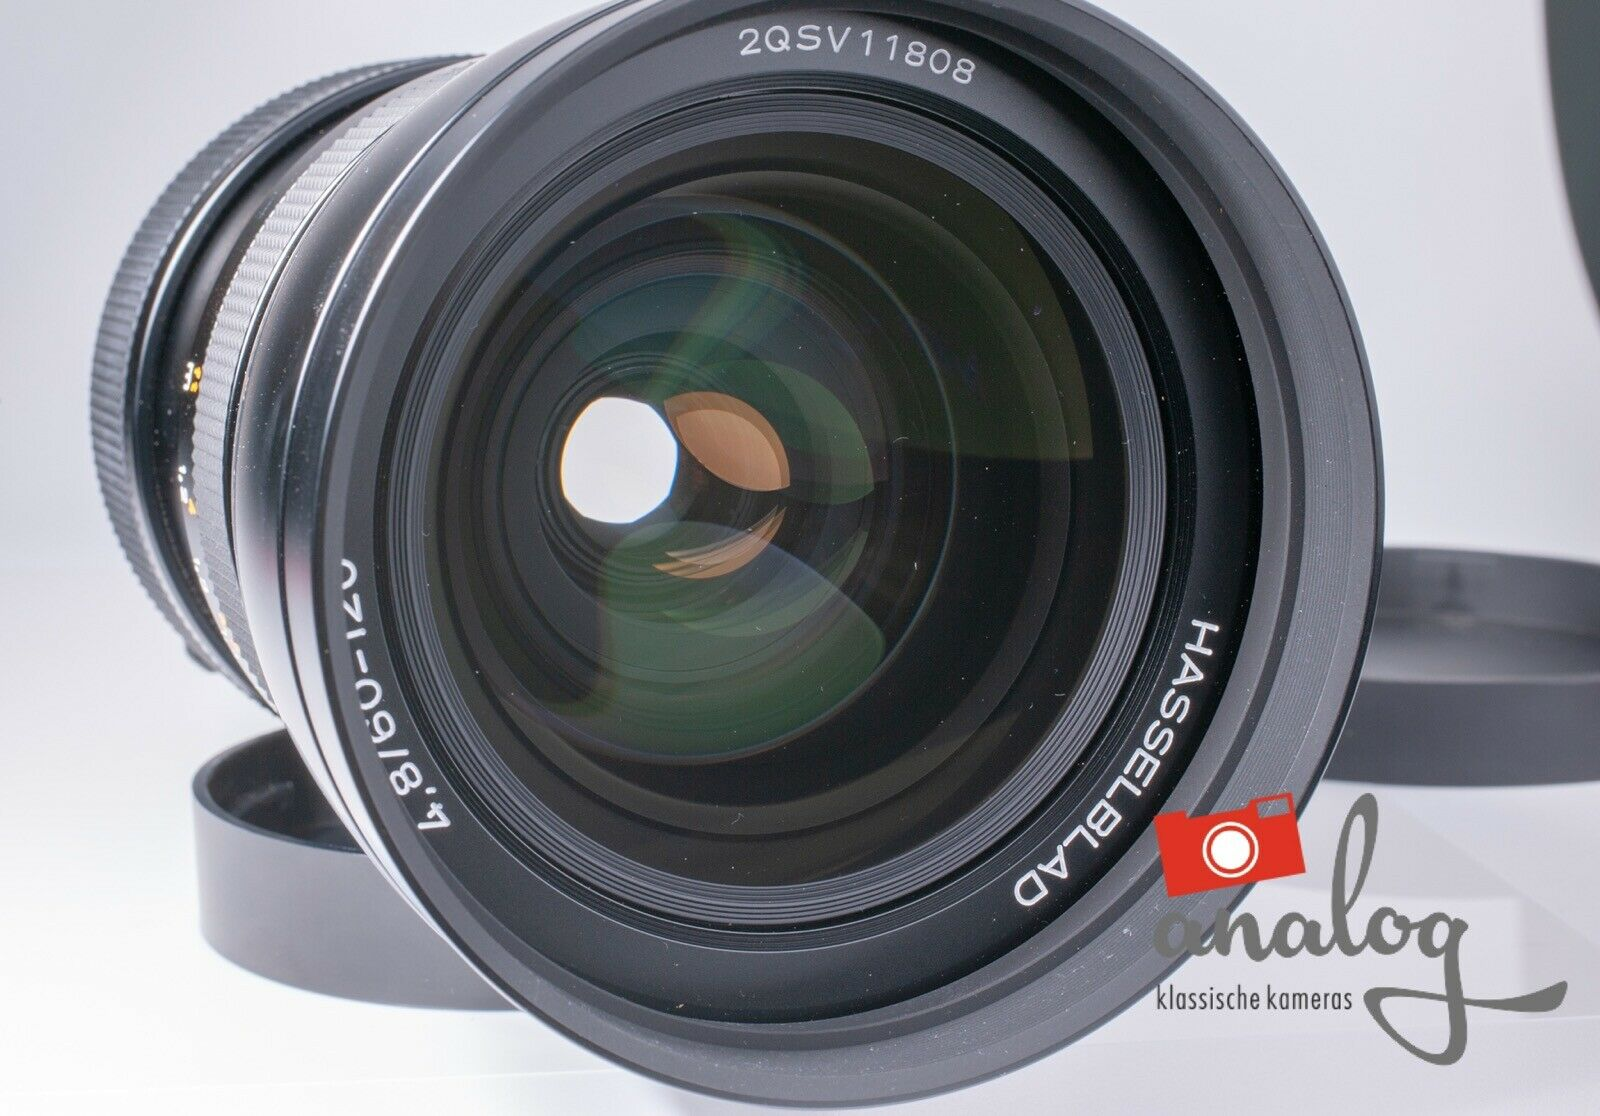 Hasselblad FE 60-120mm 4.8